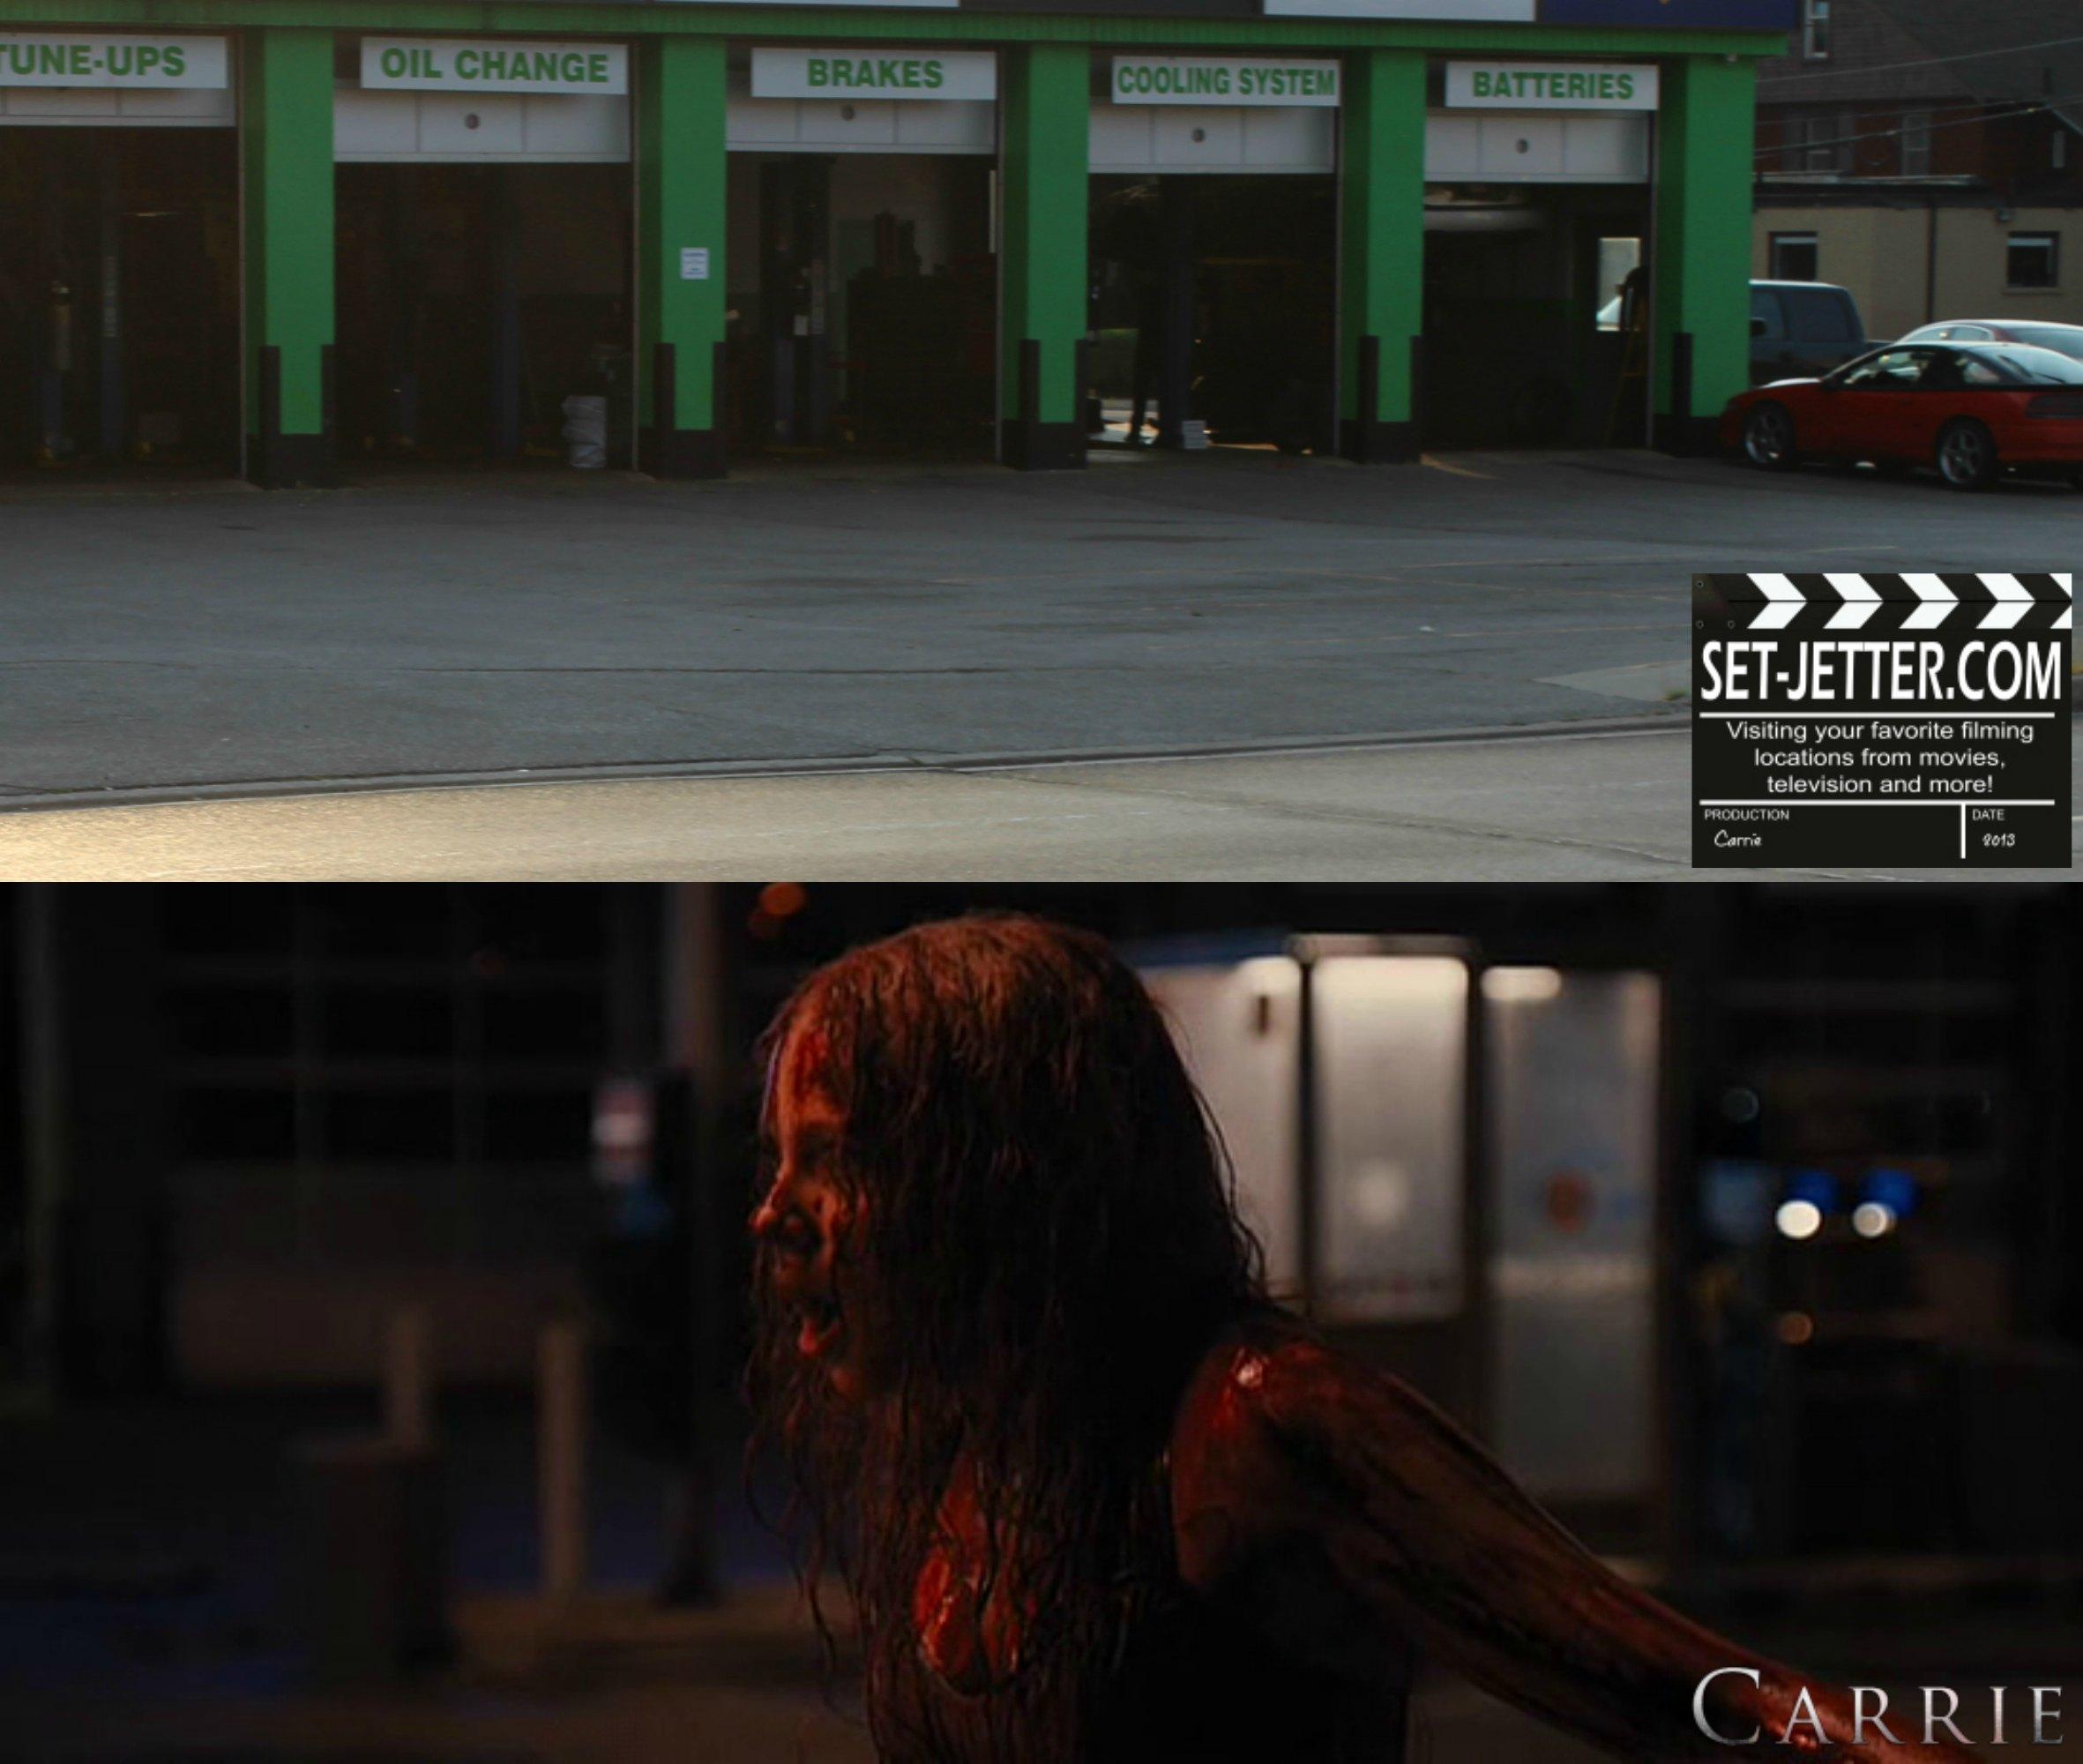 Carrie 2013 comparison 171.jpg